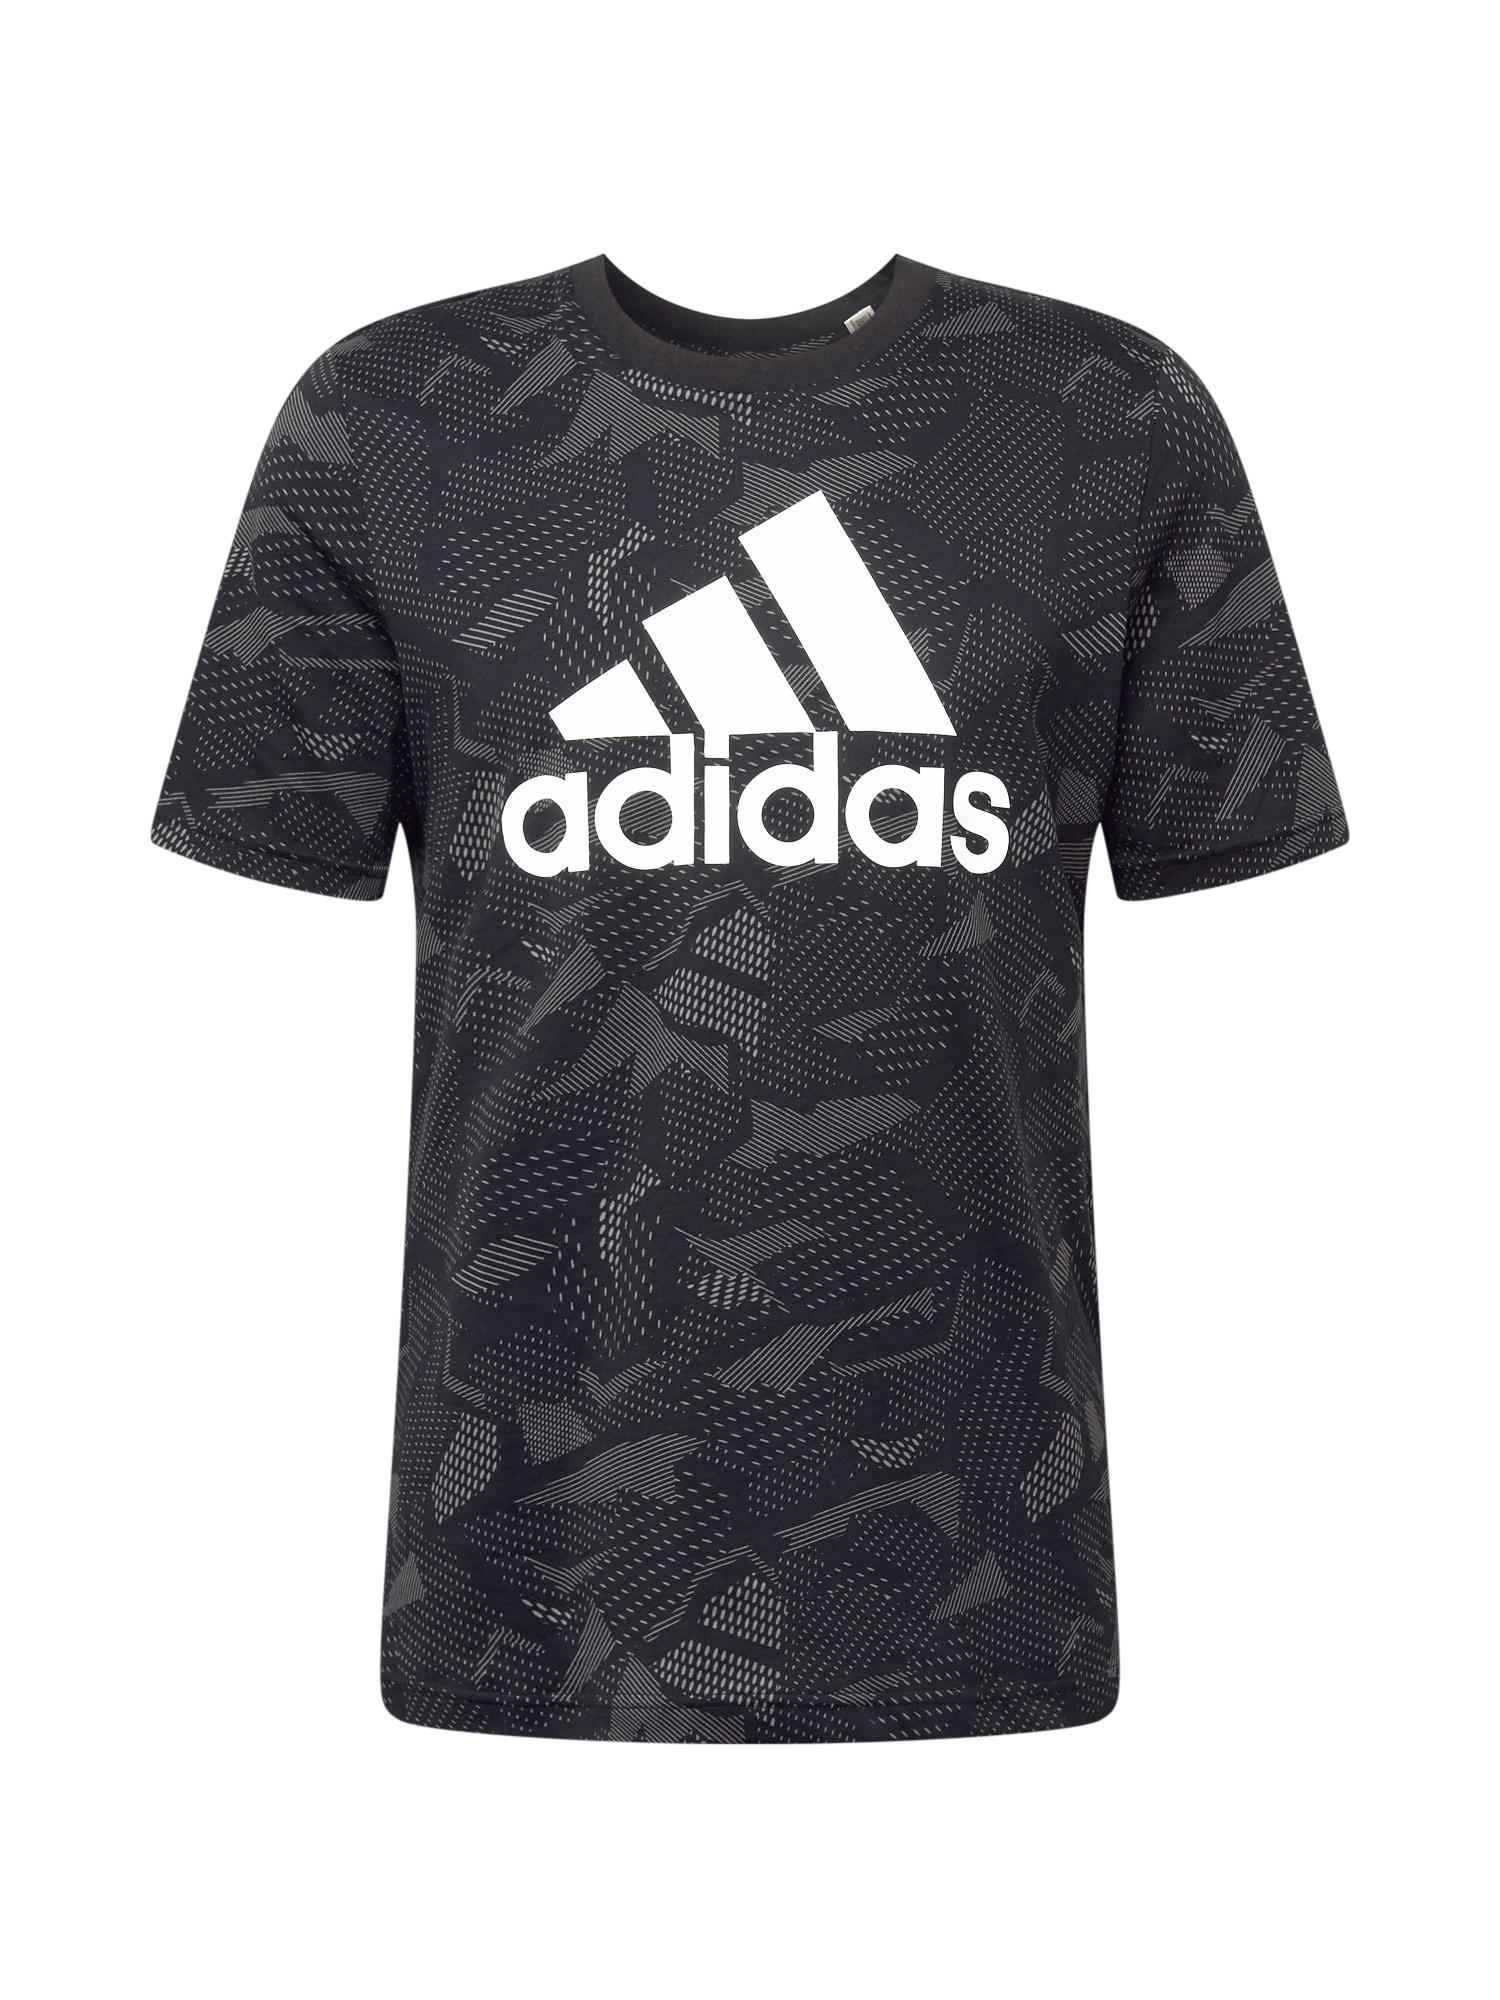 ADIDAS PERFORMANCE Funkční tričko  šedá / černá / bílá